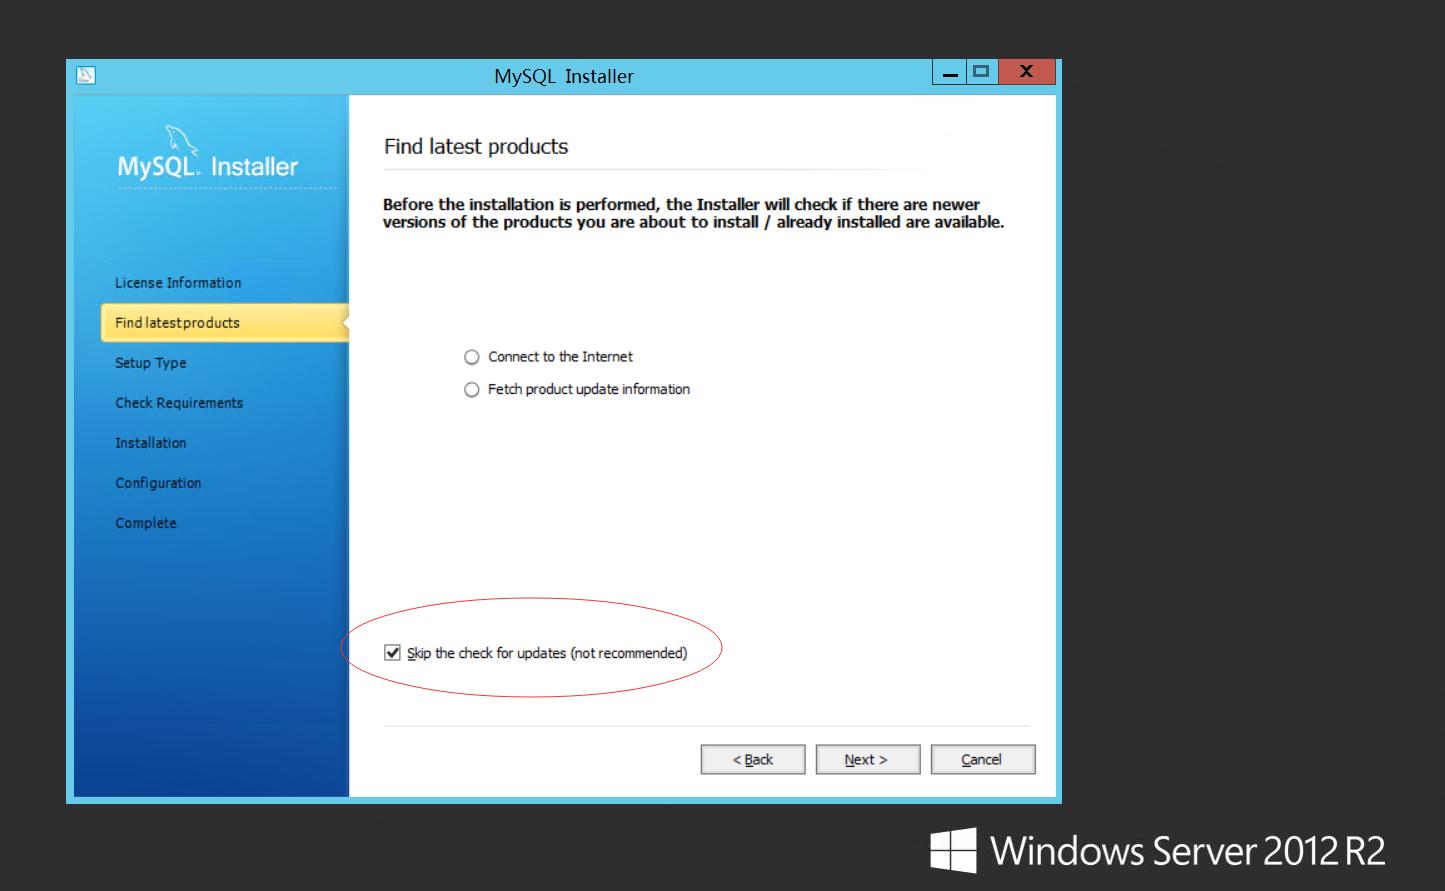 Windows Server 2012 配置指南 之 MySQL环境搭建篇